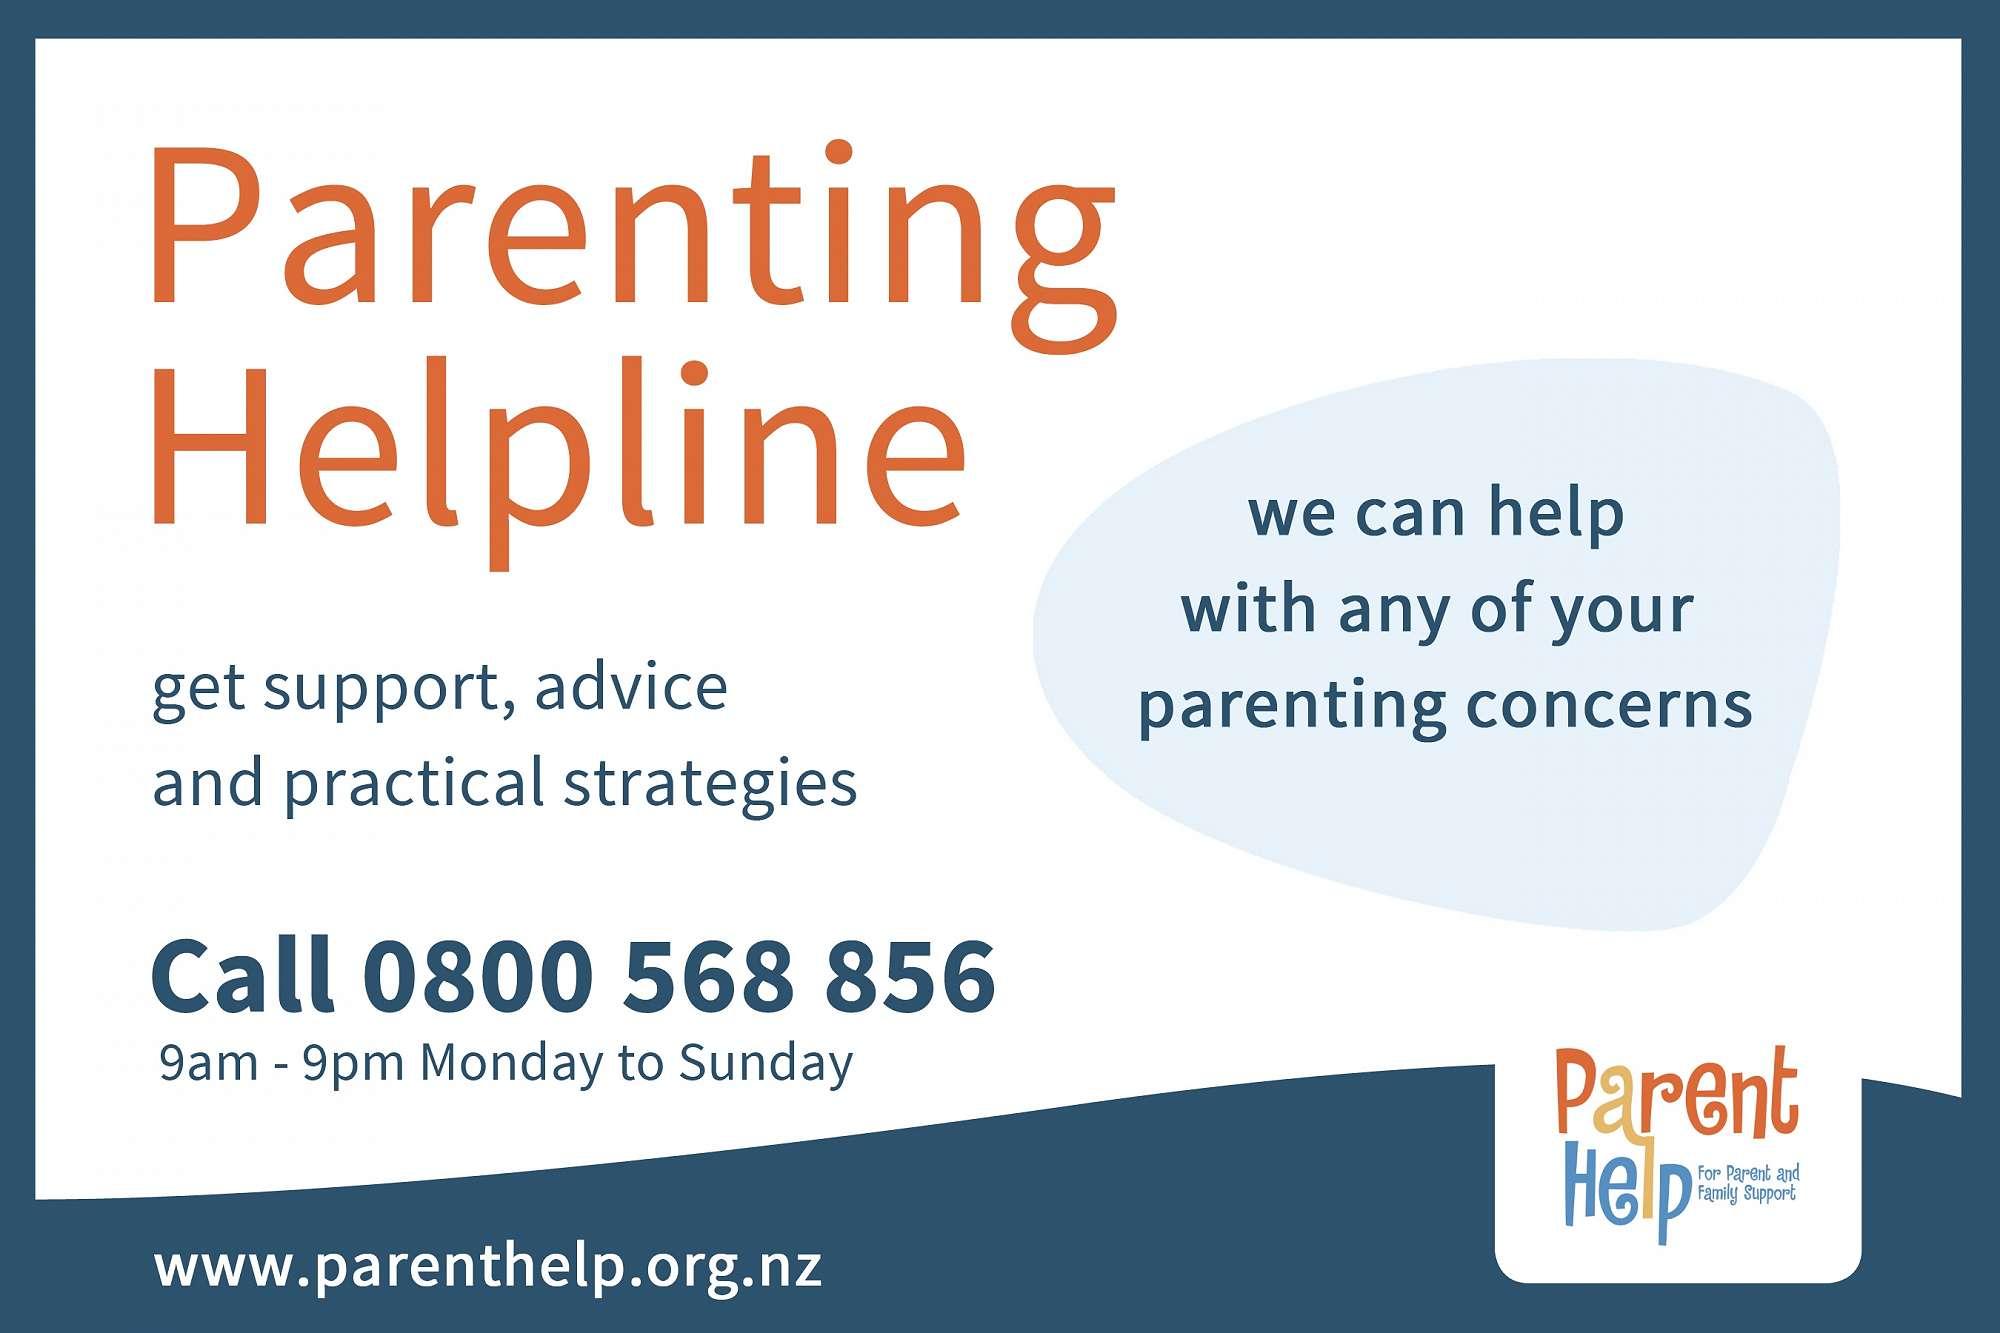 Practical Strategies For Parenting >> Parenting Helpline